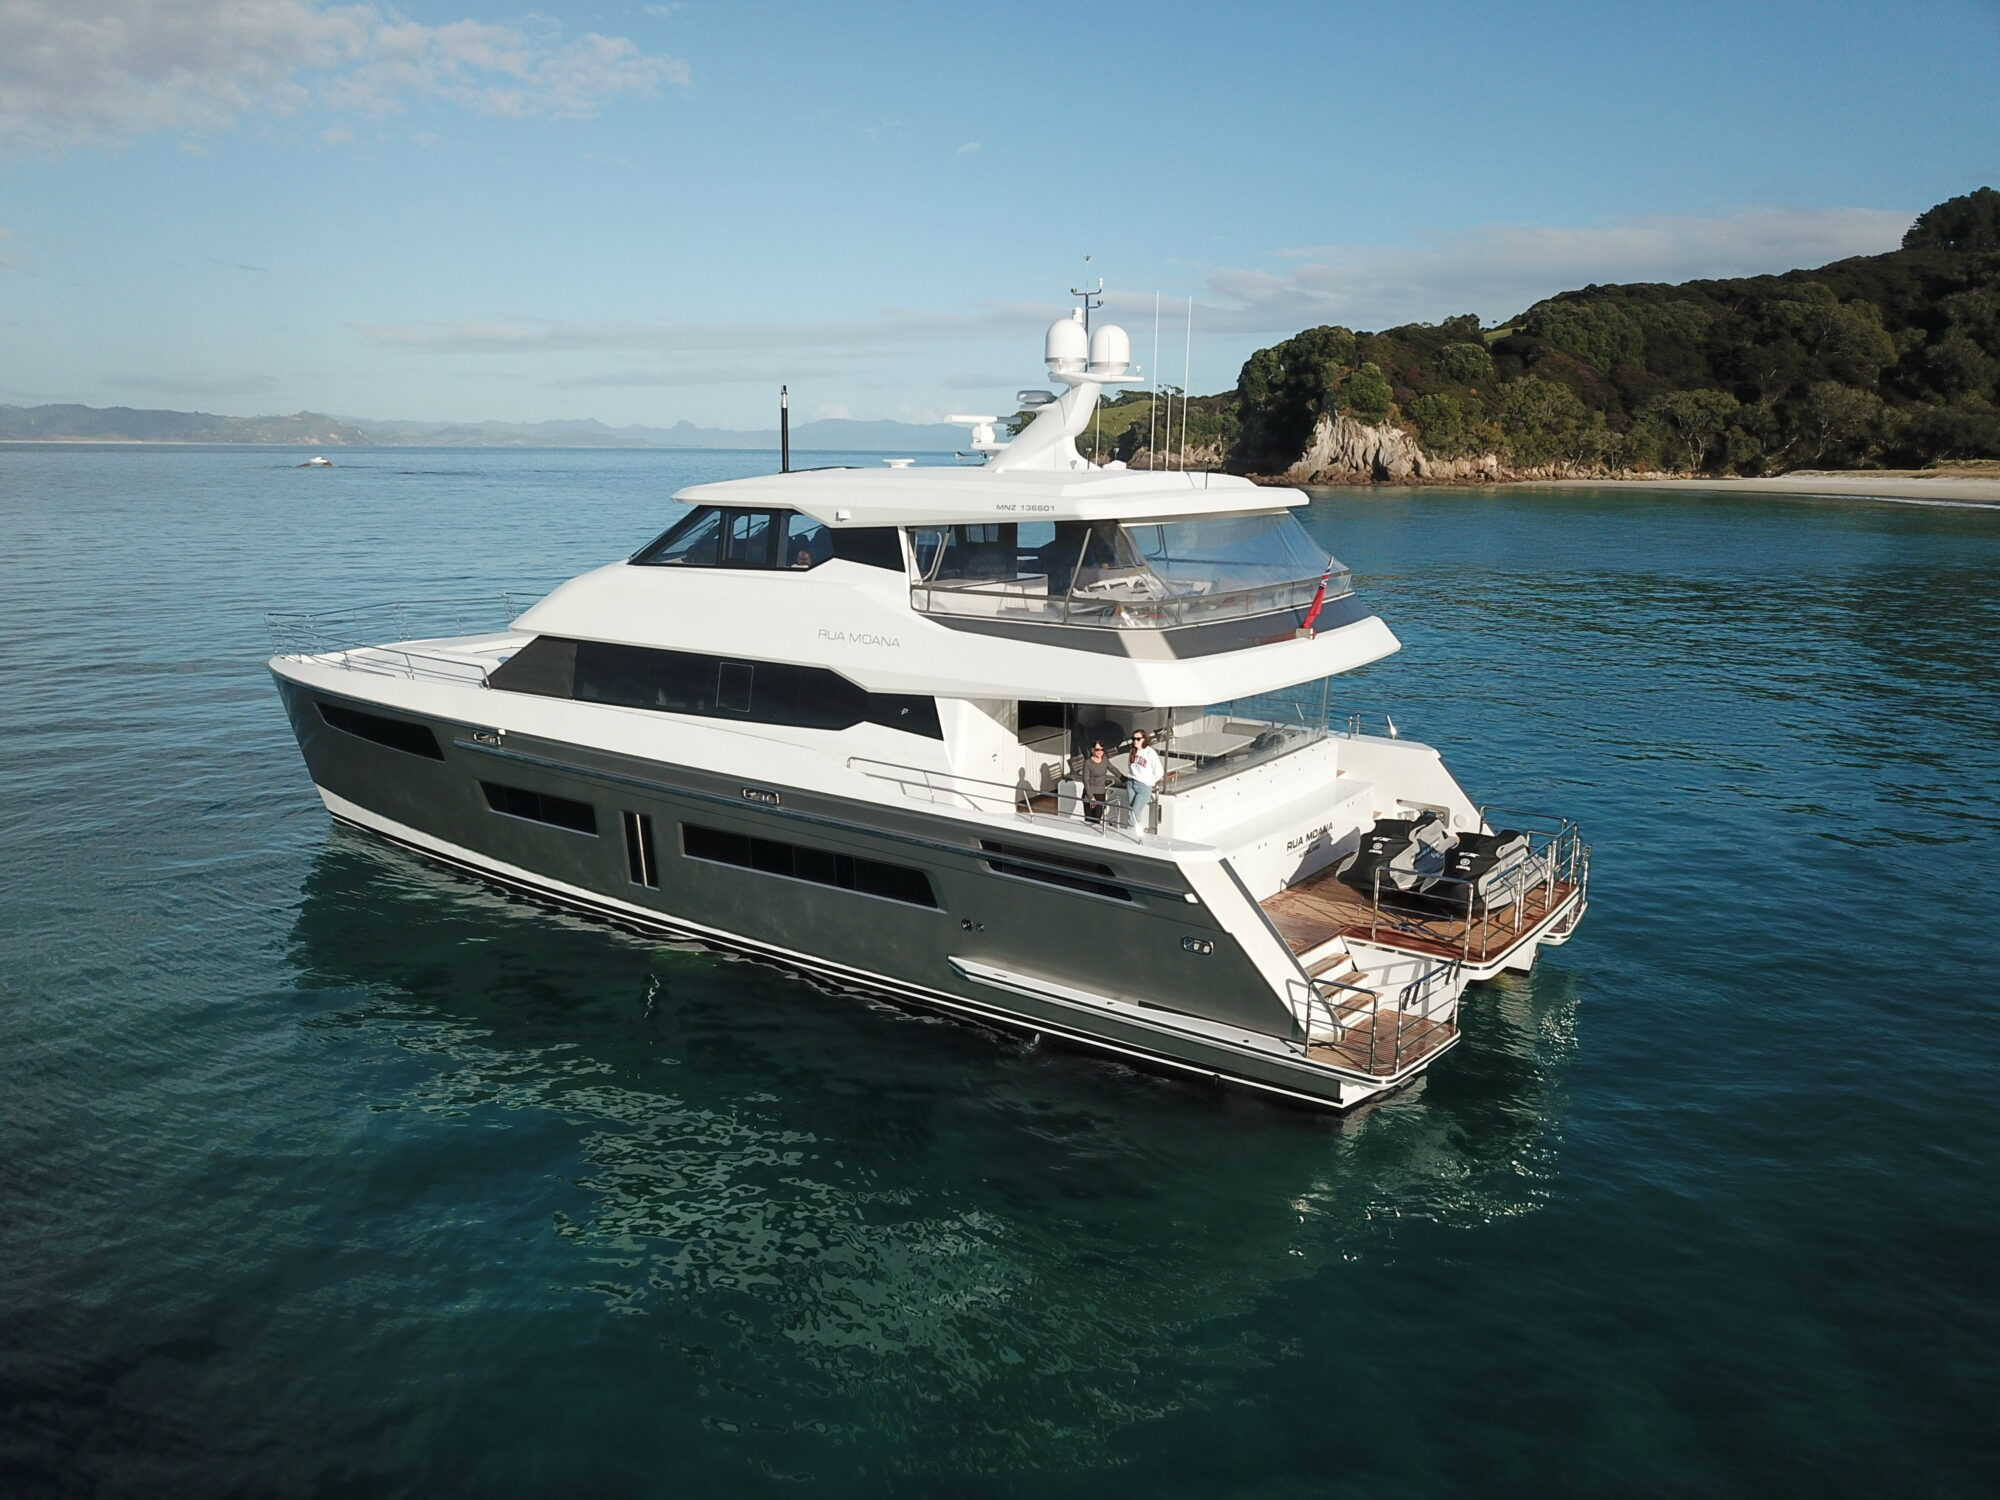 M/Y RUA MOANA for charter with SuperYachtsMonaco